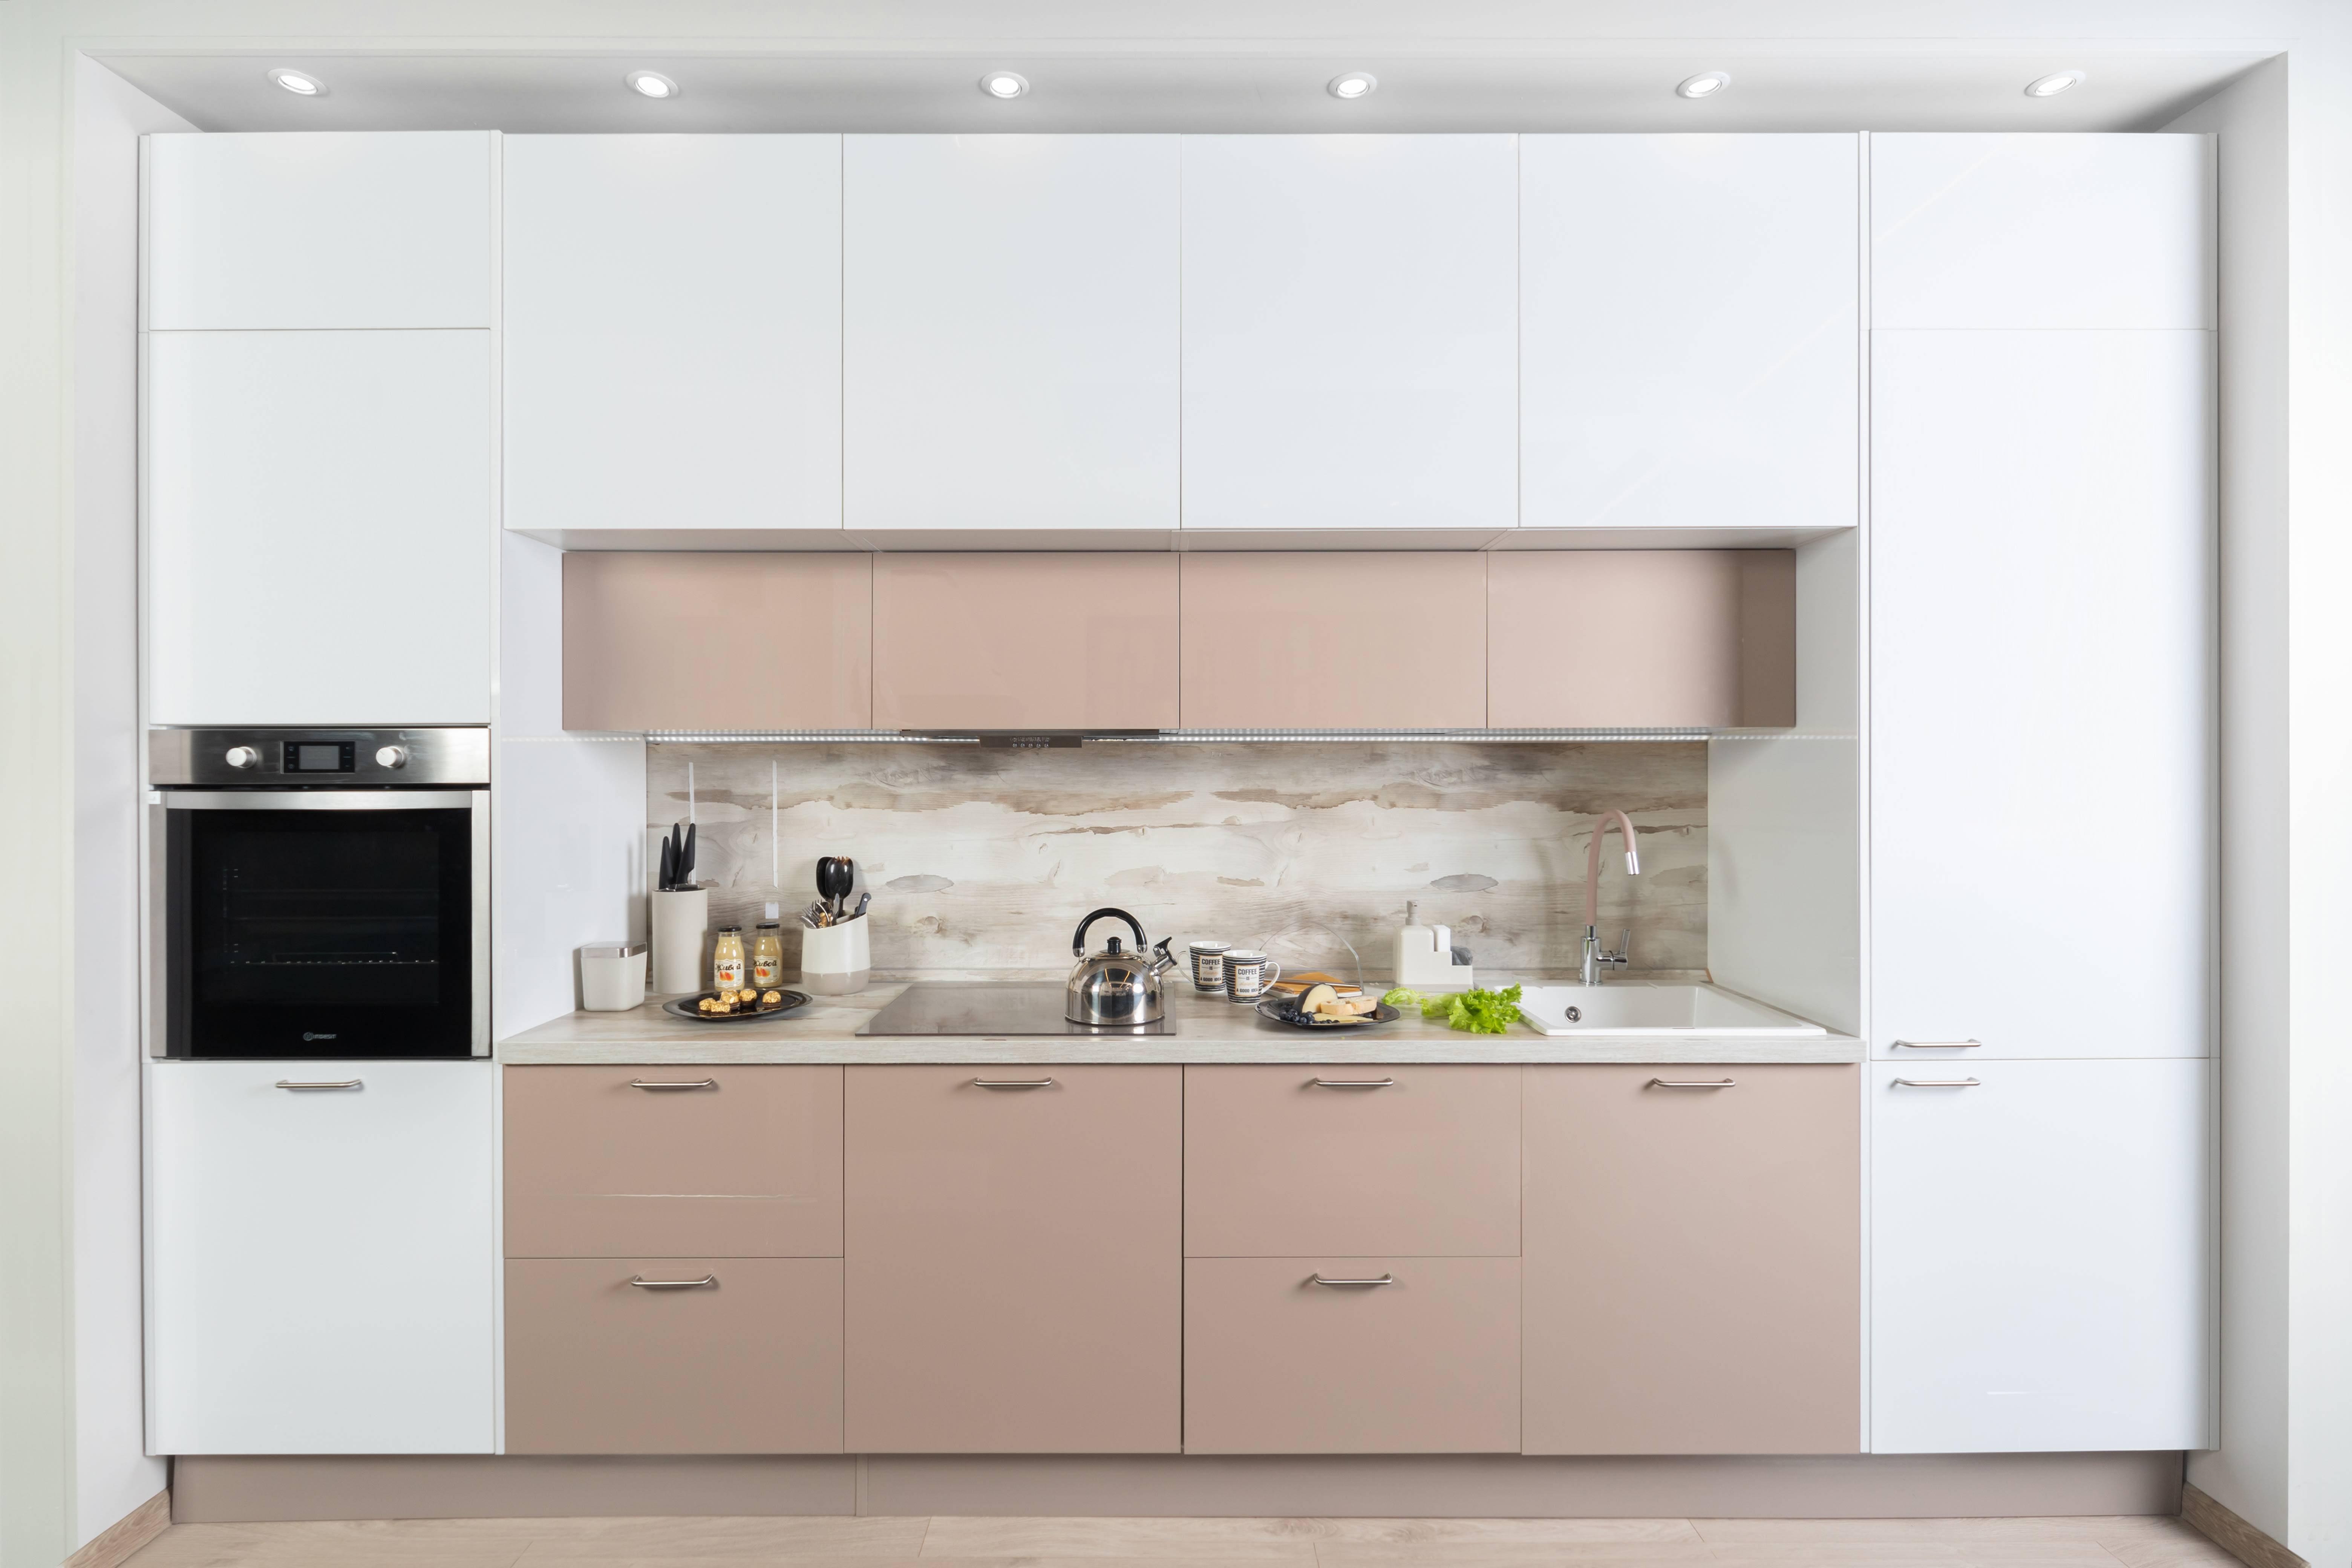 Кухни леруа мерлен - каталог (47 фото + цены)